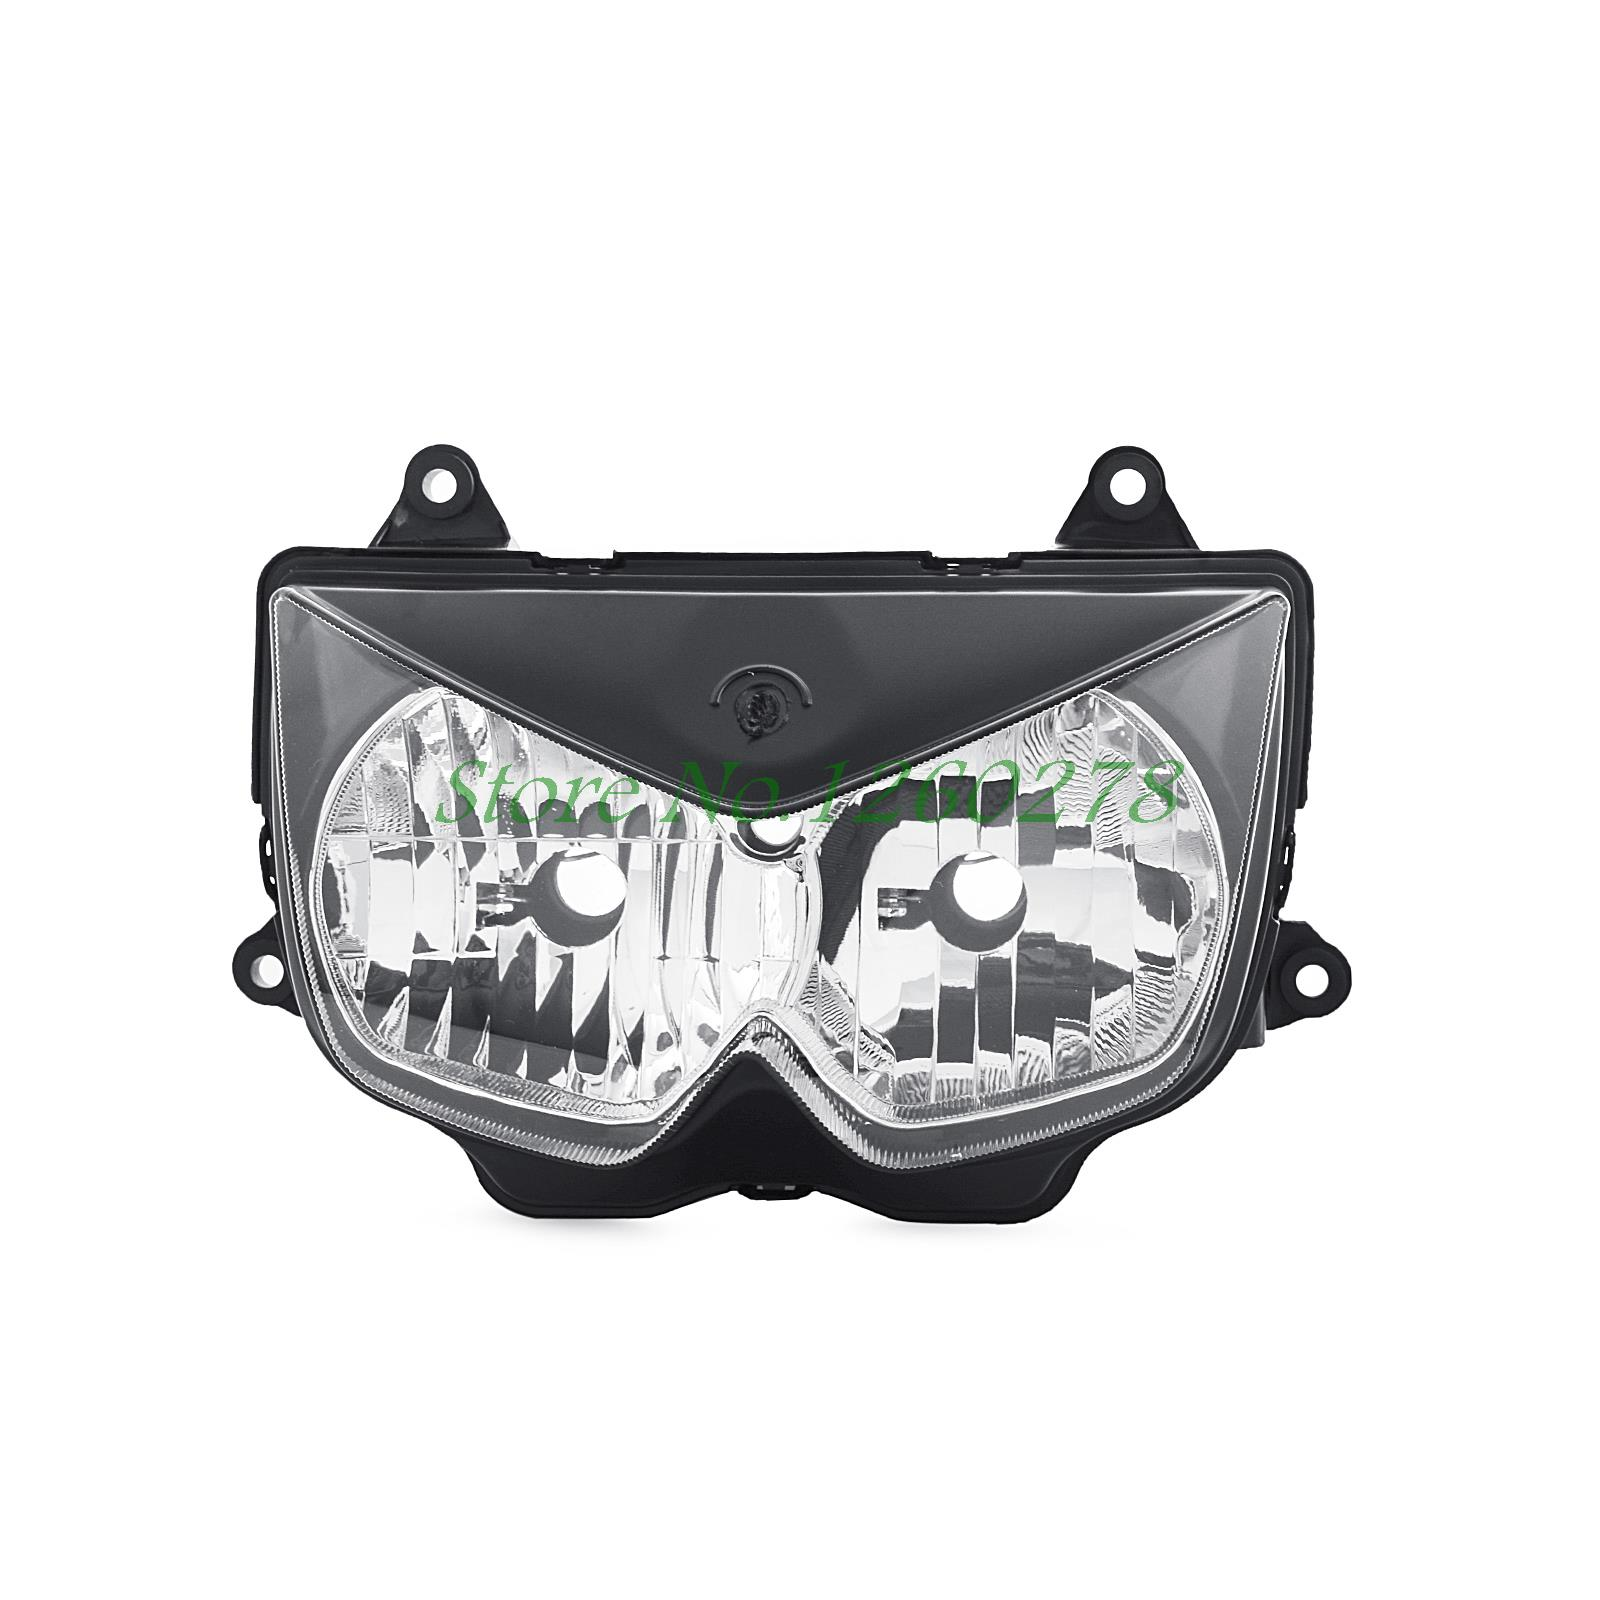 High Quality Motorcycle ABS Plastic Replacement Headlamp Headlight For Kawasaki Ninja 250R 2008 -2012 Z1000 2003-2006